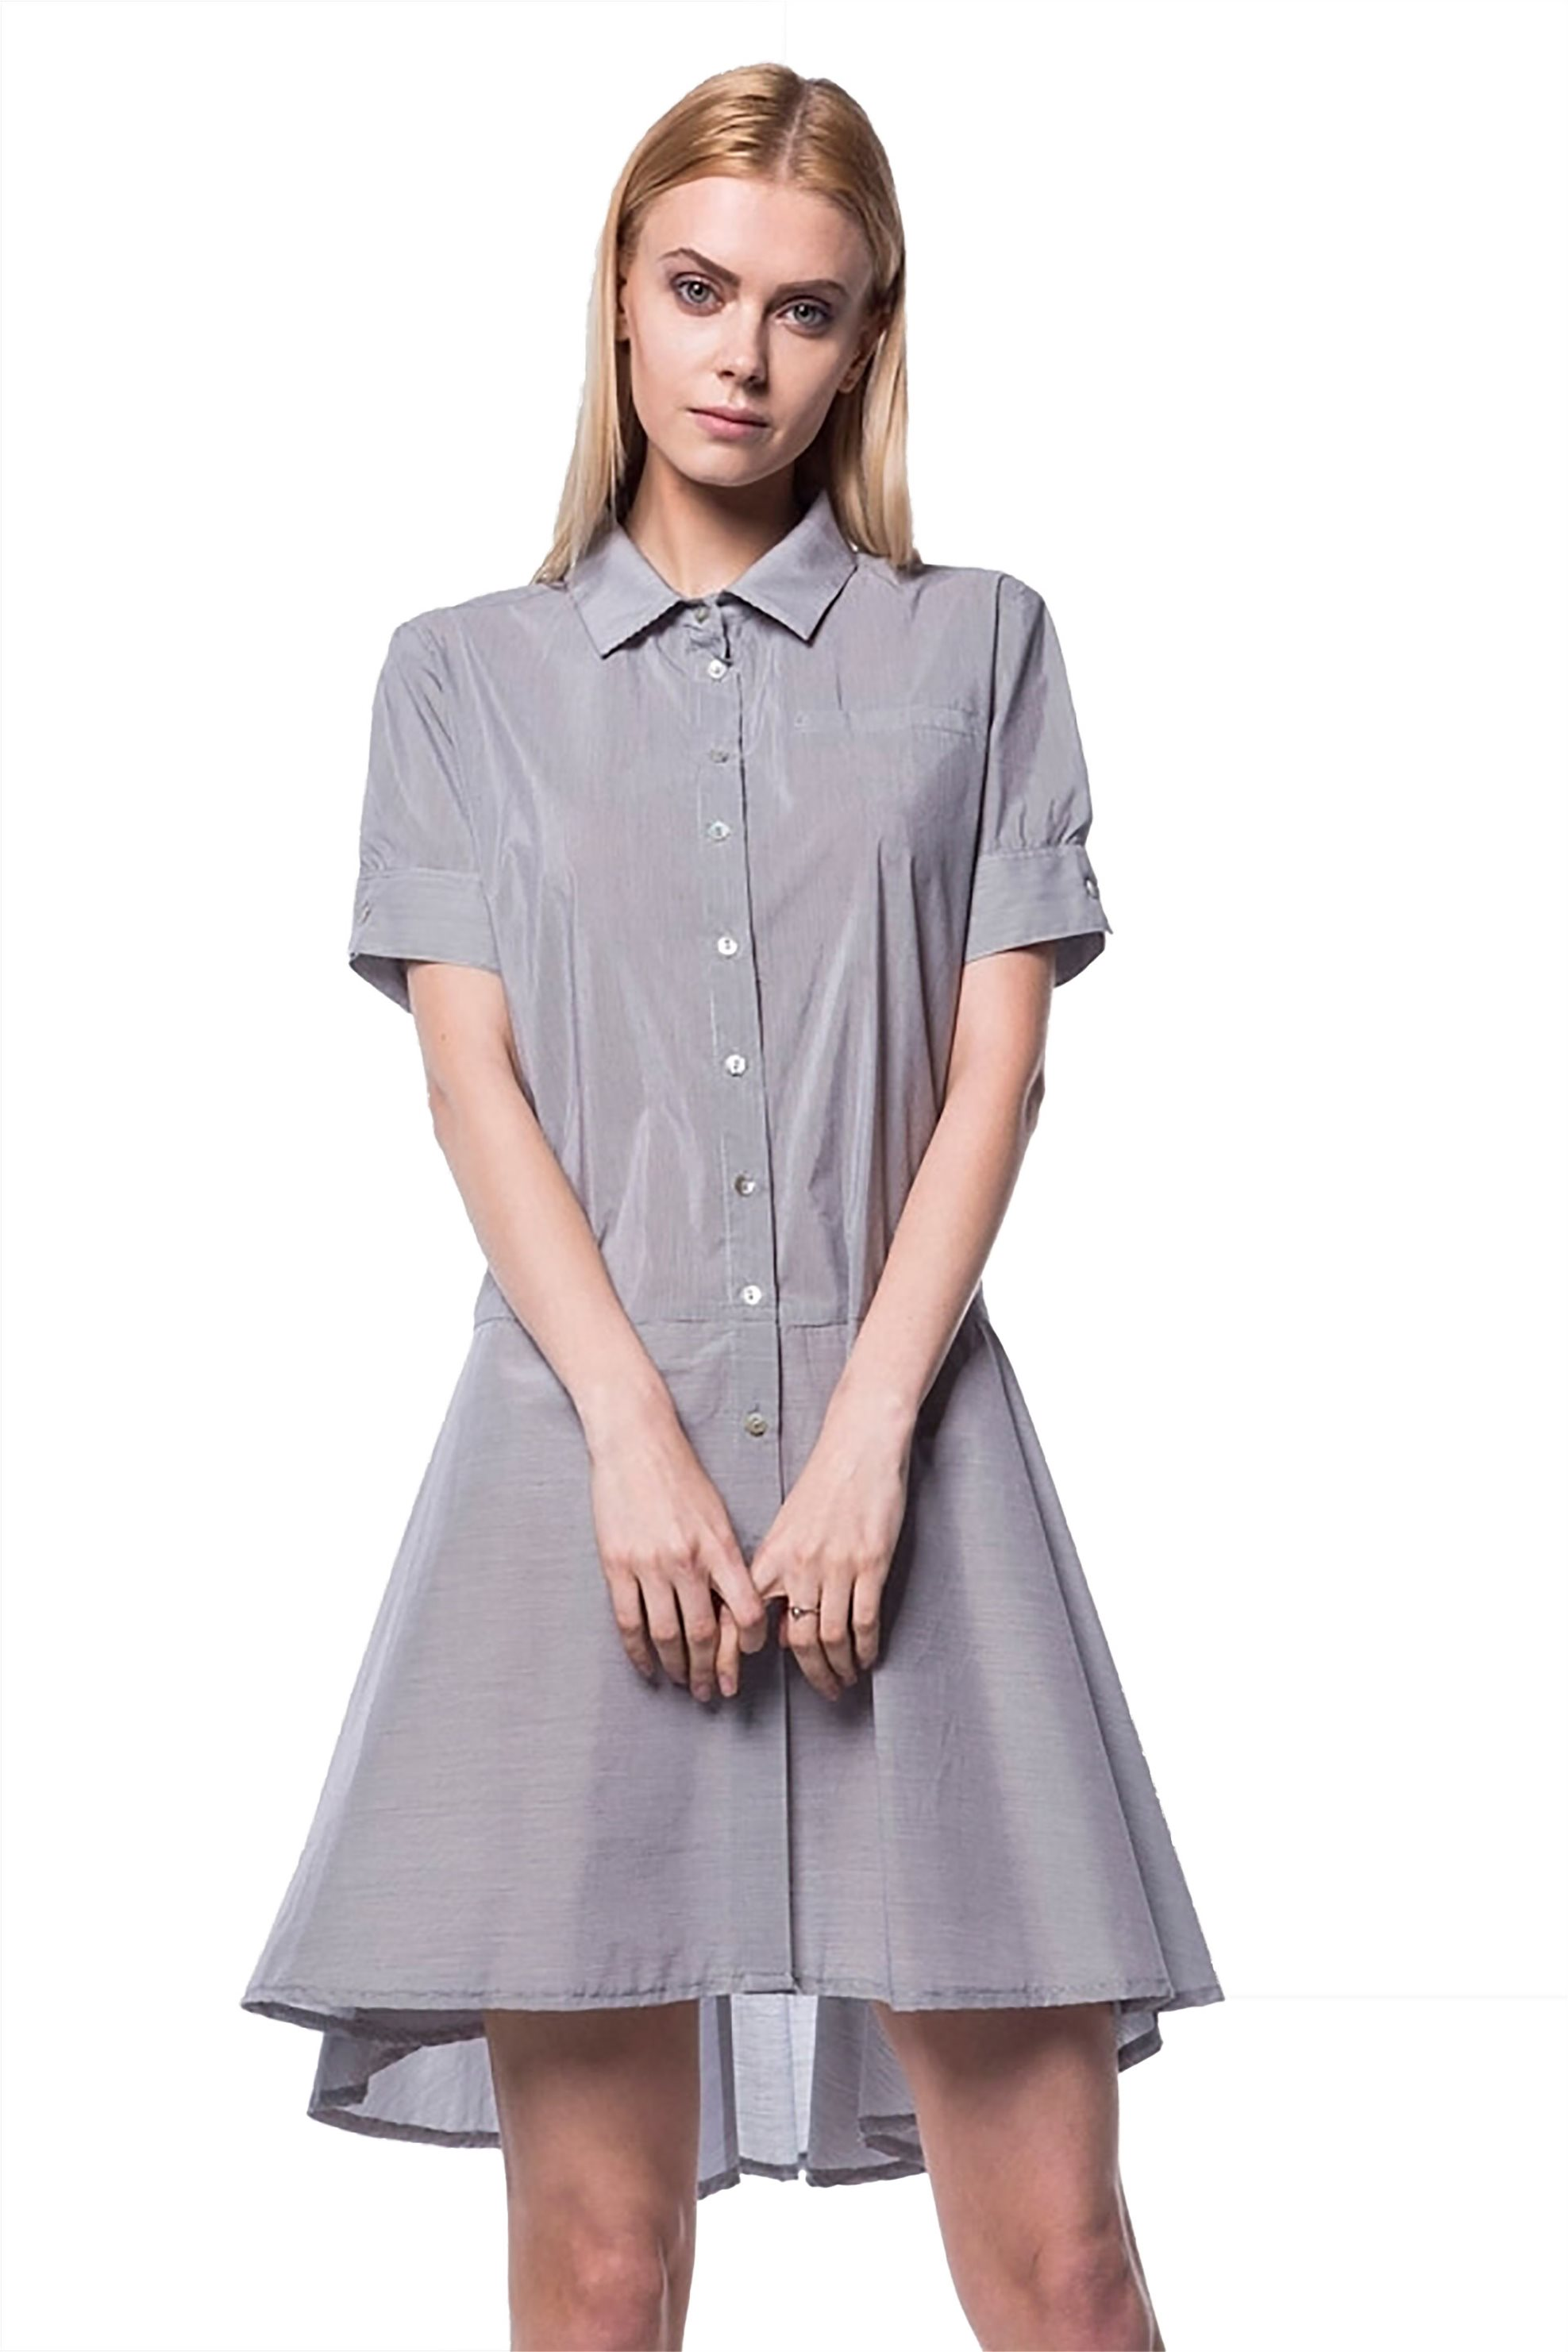 49489e4102bf Γυναικεία   Ρούχα   Φορέματα   Καθημερινά   Γυναικείο φόρεμα με γιακά και  πατιλέτα Helmi - 41-05-066 - Γκρι - GoldenShopping.gr